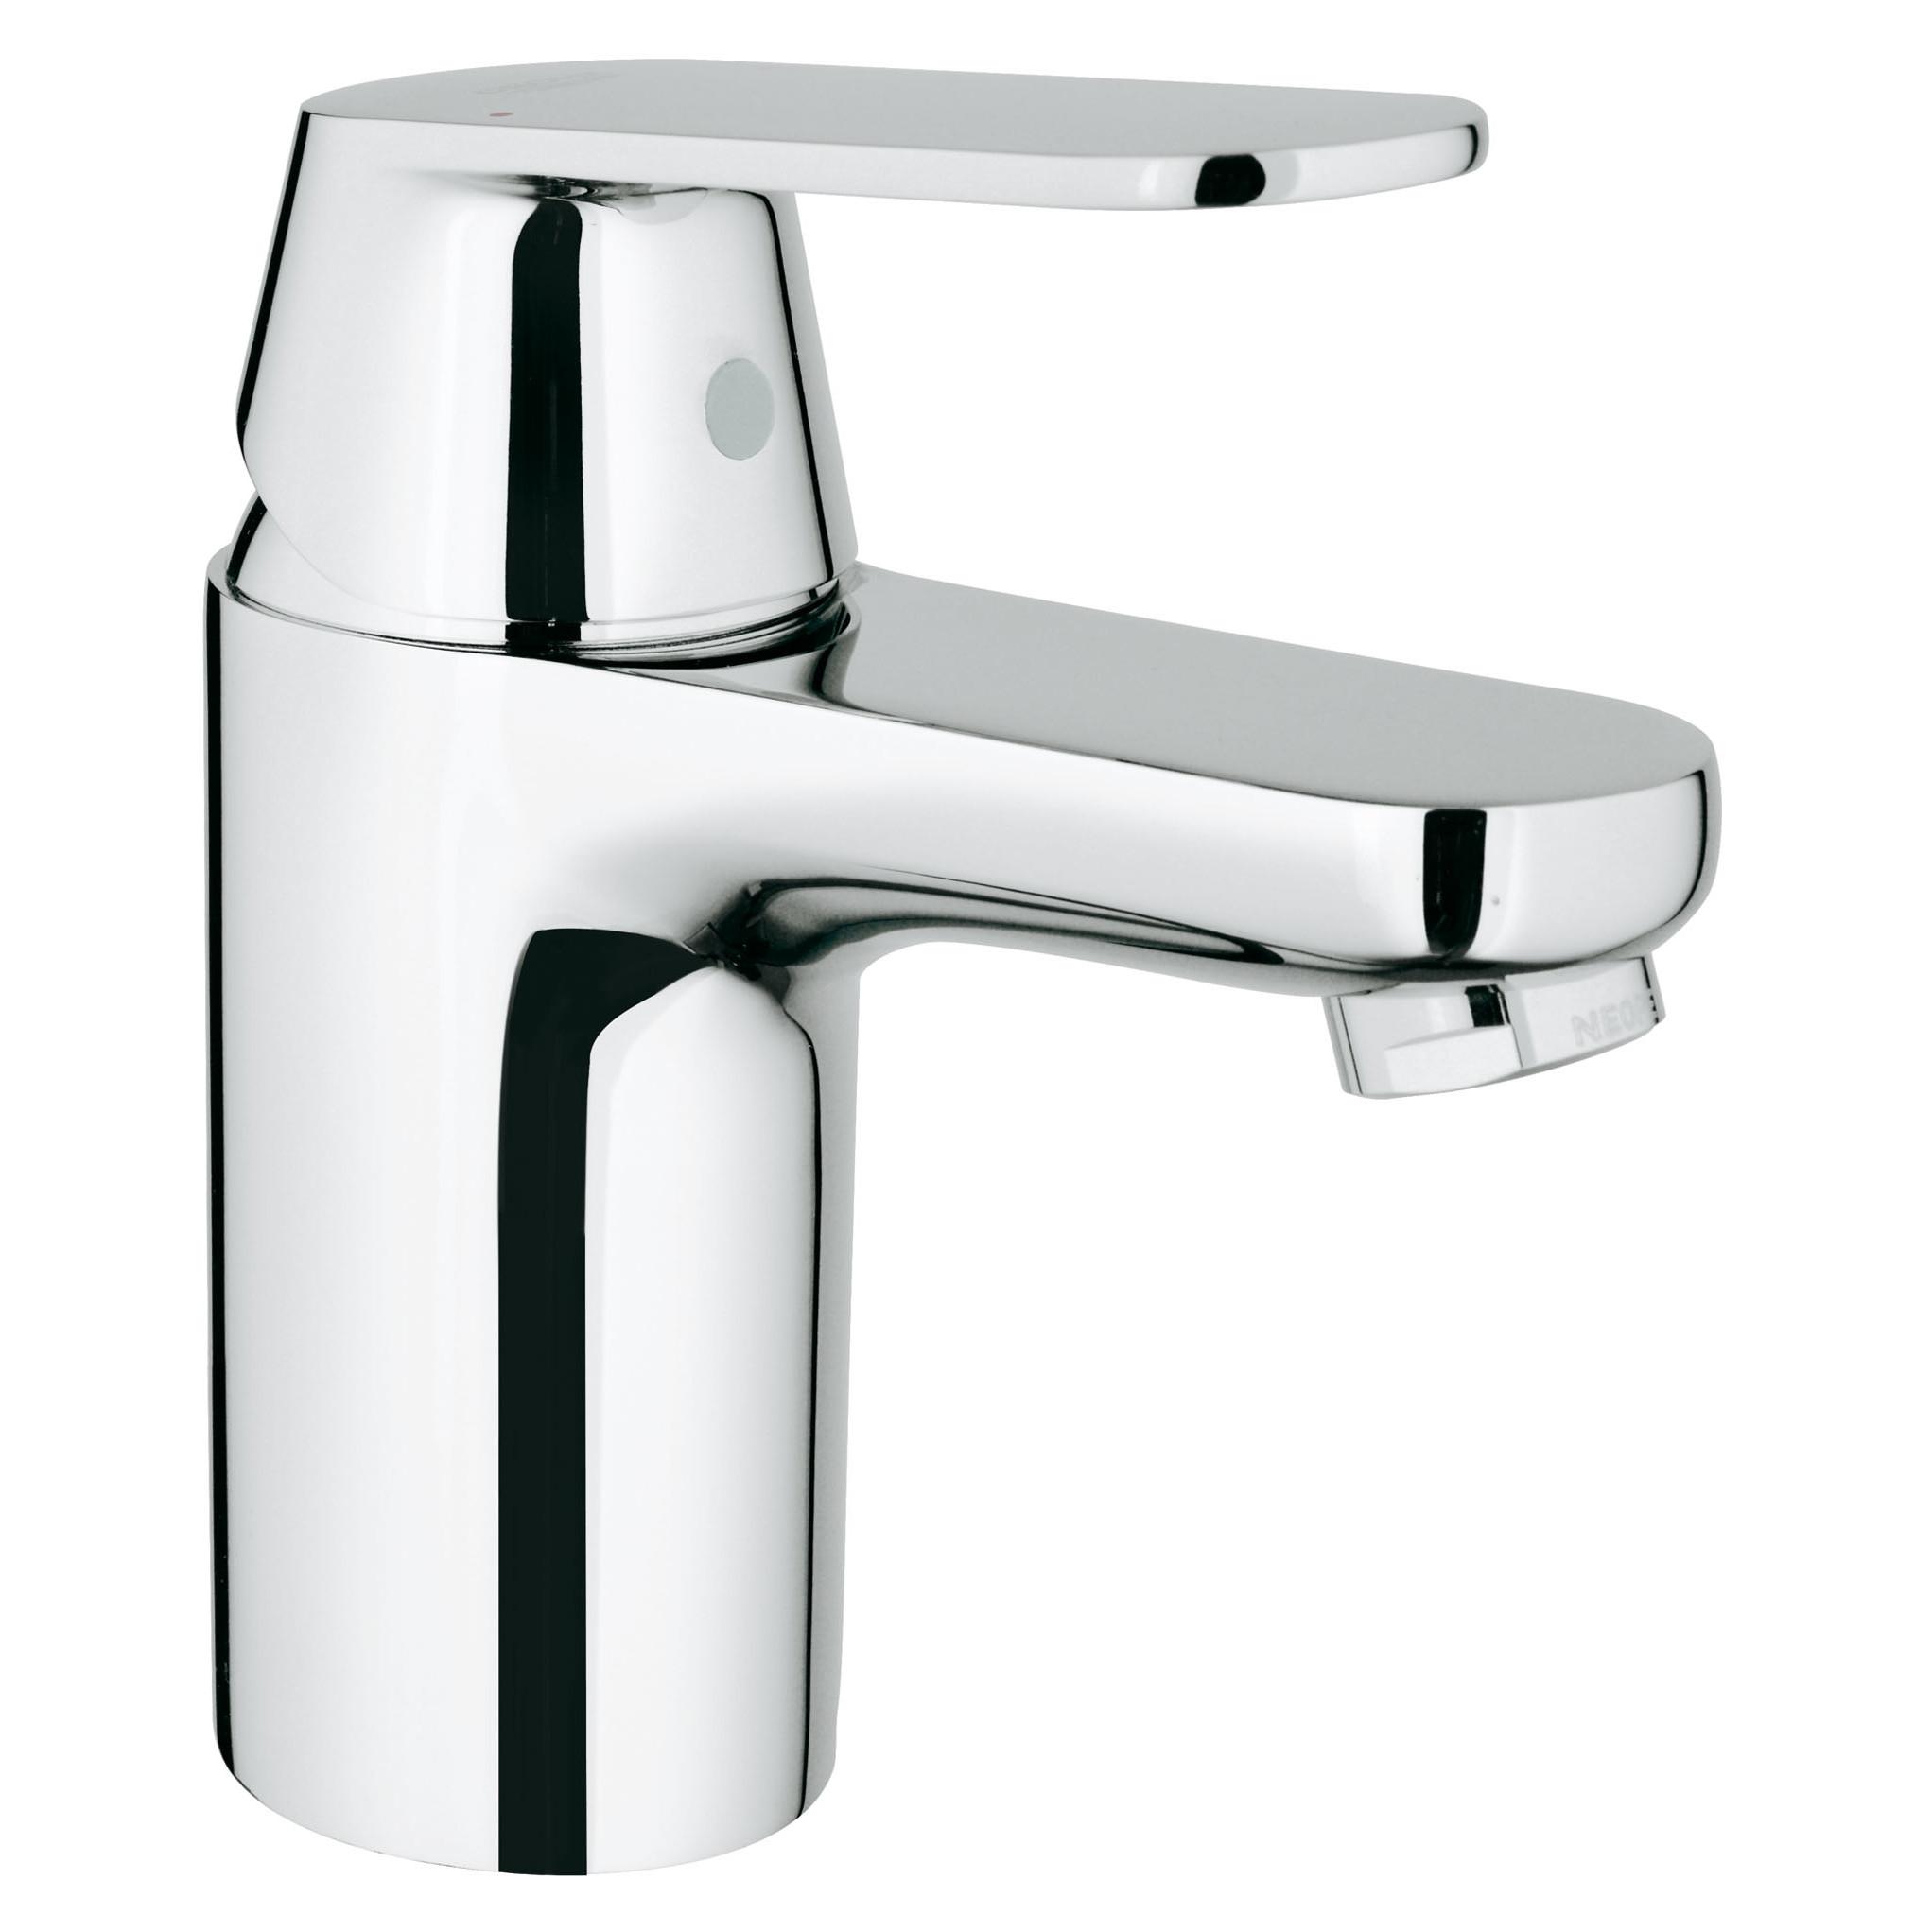 Ideas, kwc domo faucet cartridge kwc domo faucet cartridge kitchen graff faucets parts giagni fresco stainless steel 1 handle 2043 x 2043  .